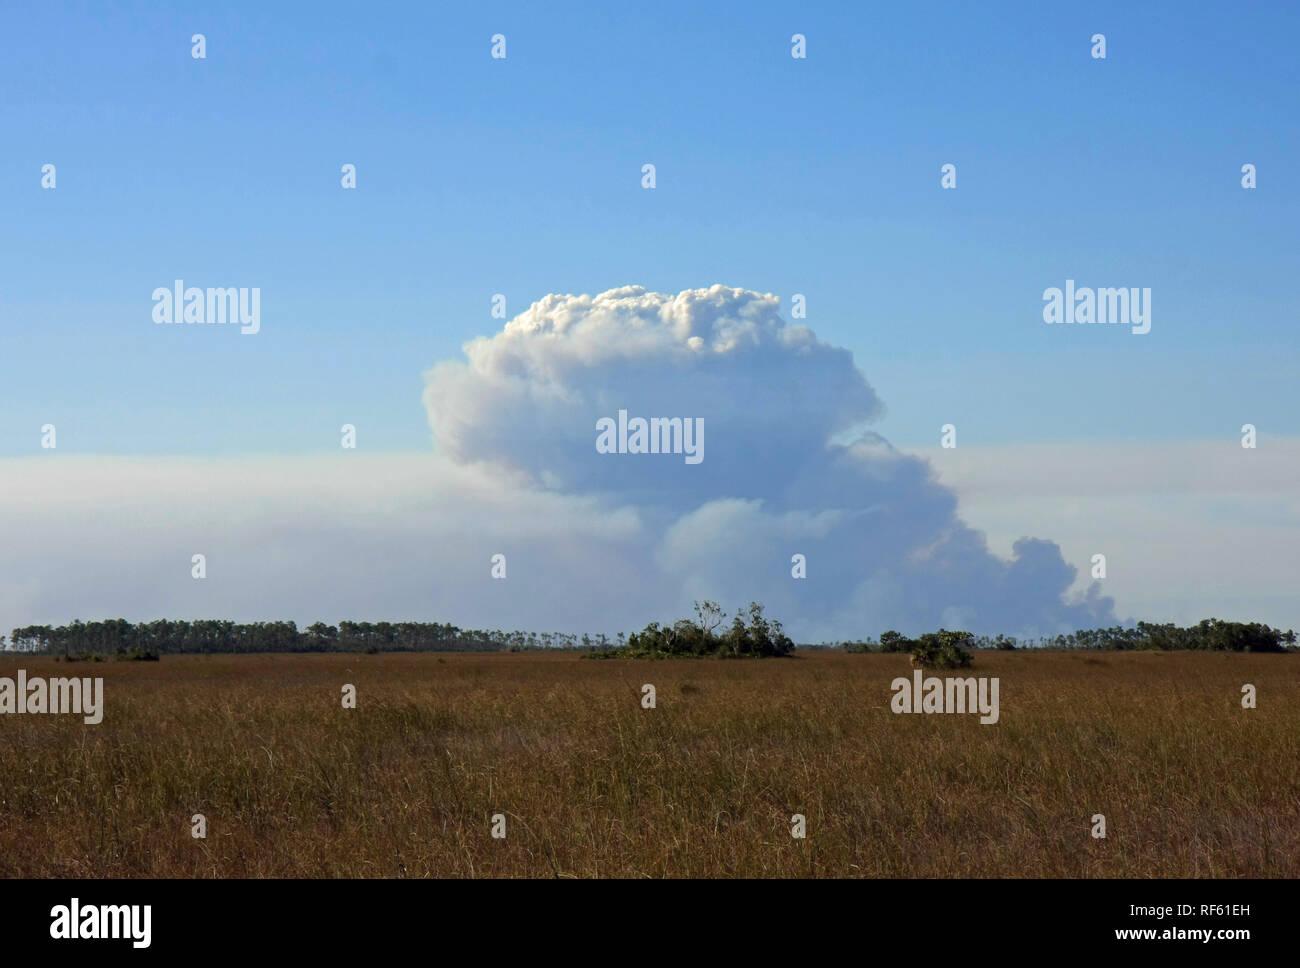 Smoke over the Sawgrass Prairie of Everglades National Park, Florida. - Stock Image